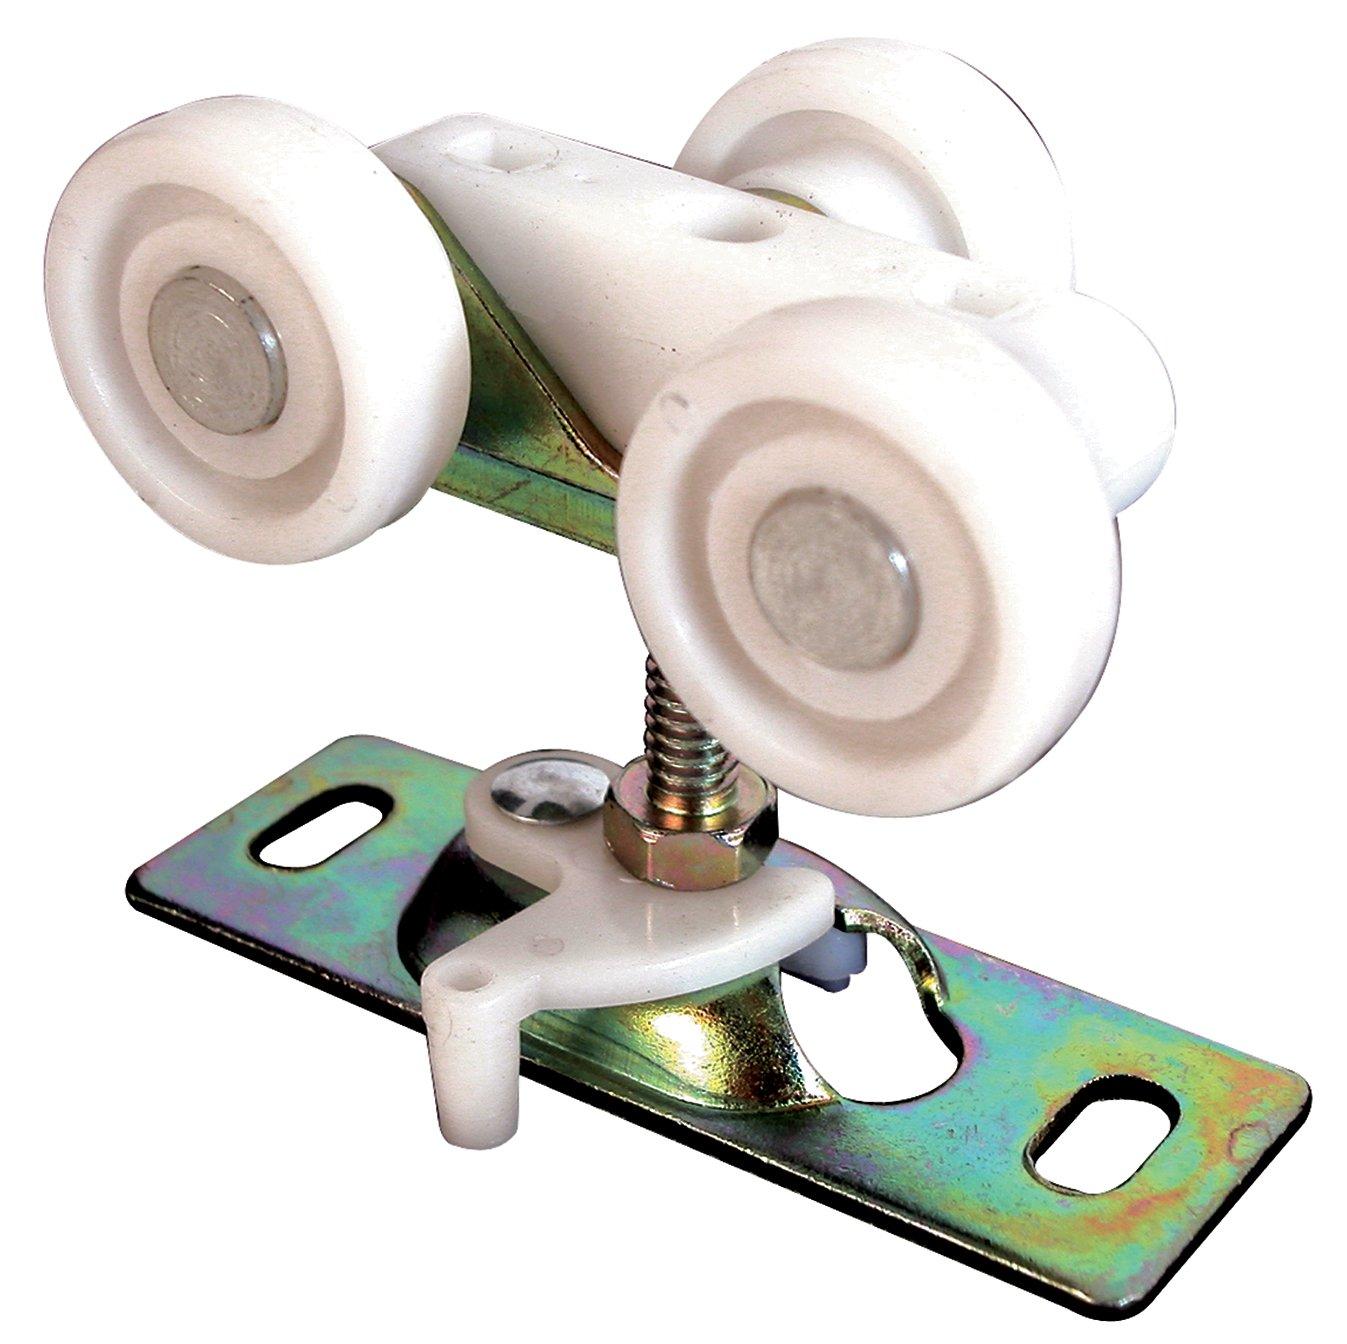 Prime Line Products N 6847 Pocket Door Roller Assembly, 3/4 In., FLAT,  Plastic Wheels On Steel Bracket (Pack Of 2)   Pocket Door Hardware    Amazon.com